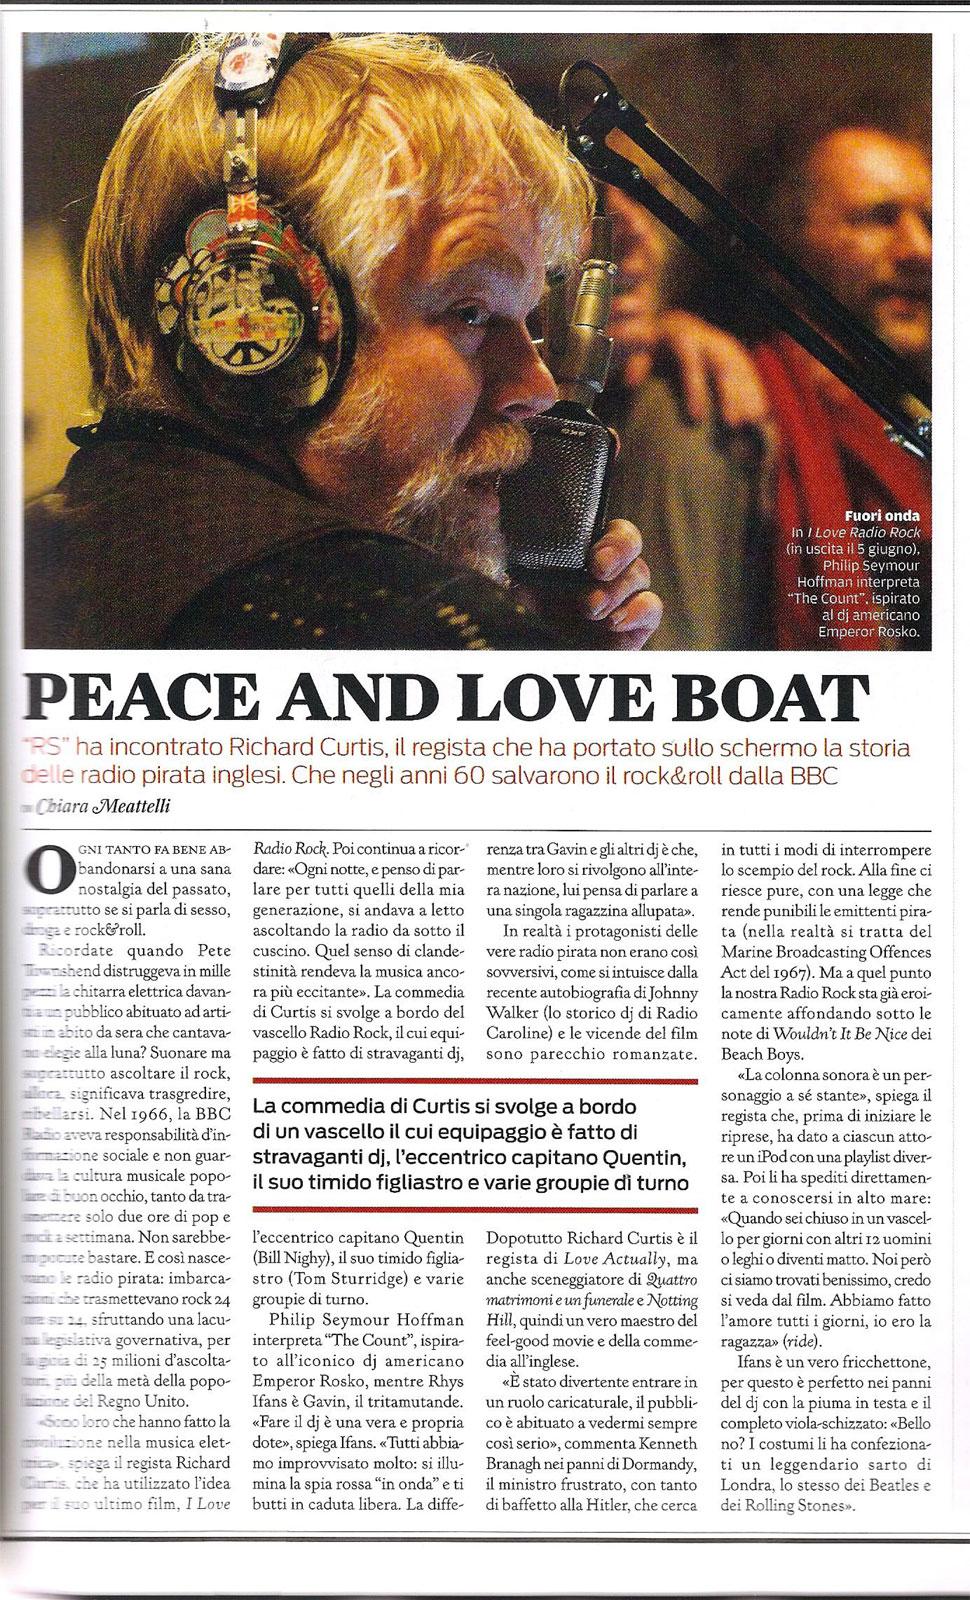 Rolling Stone magazine: Richard Curtis interview